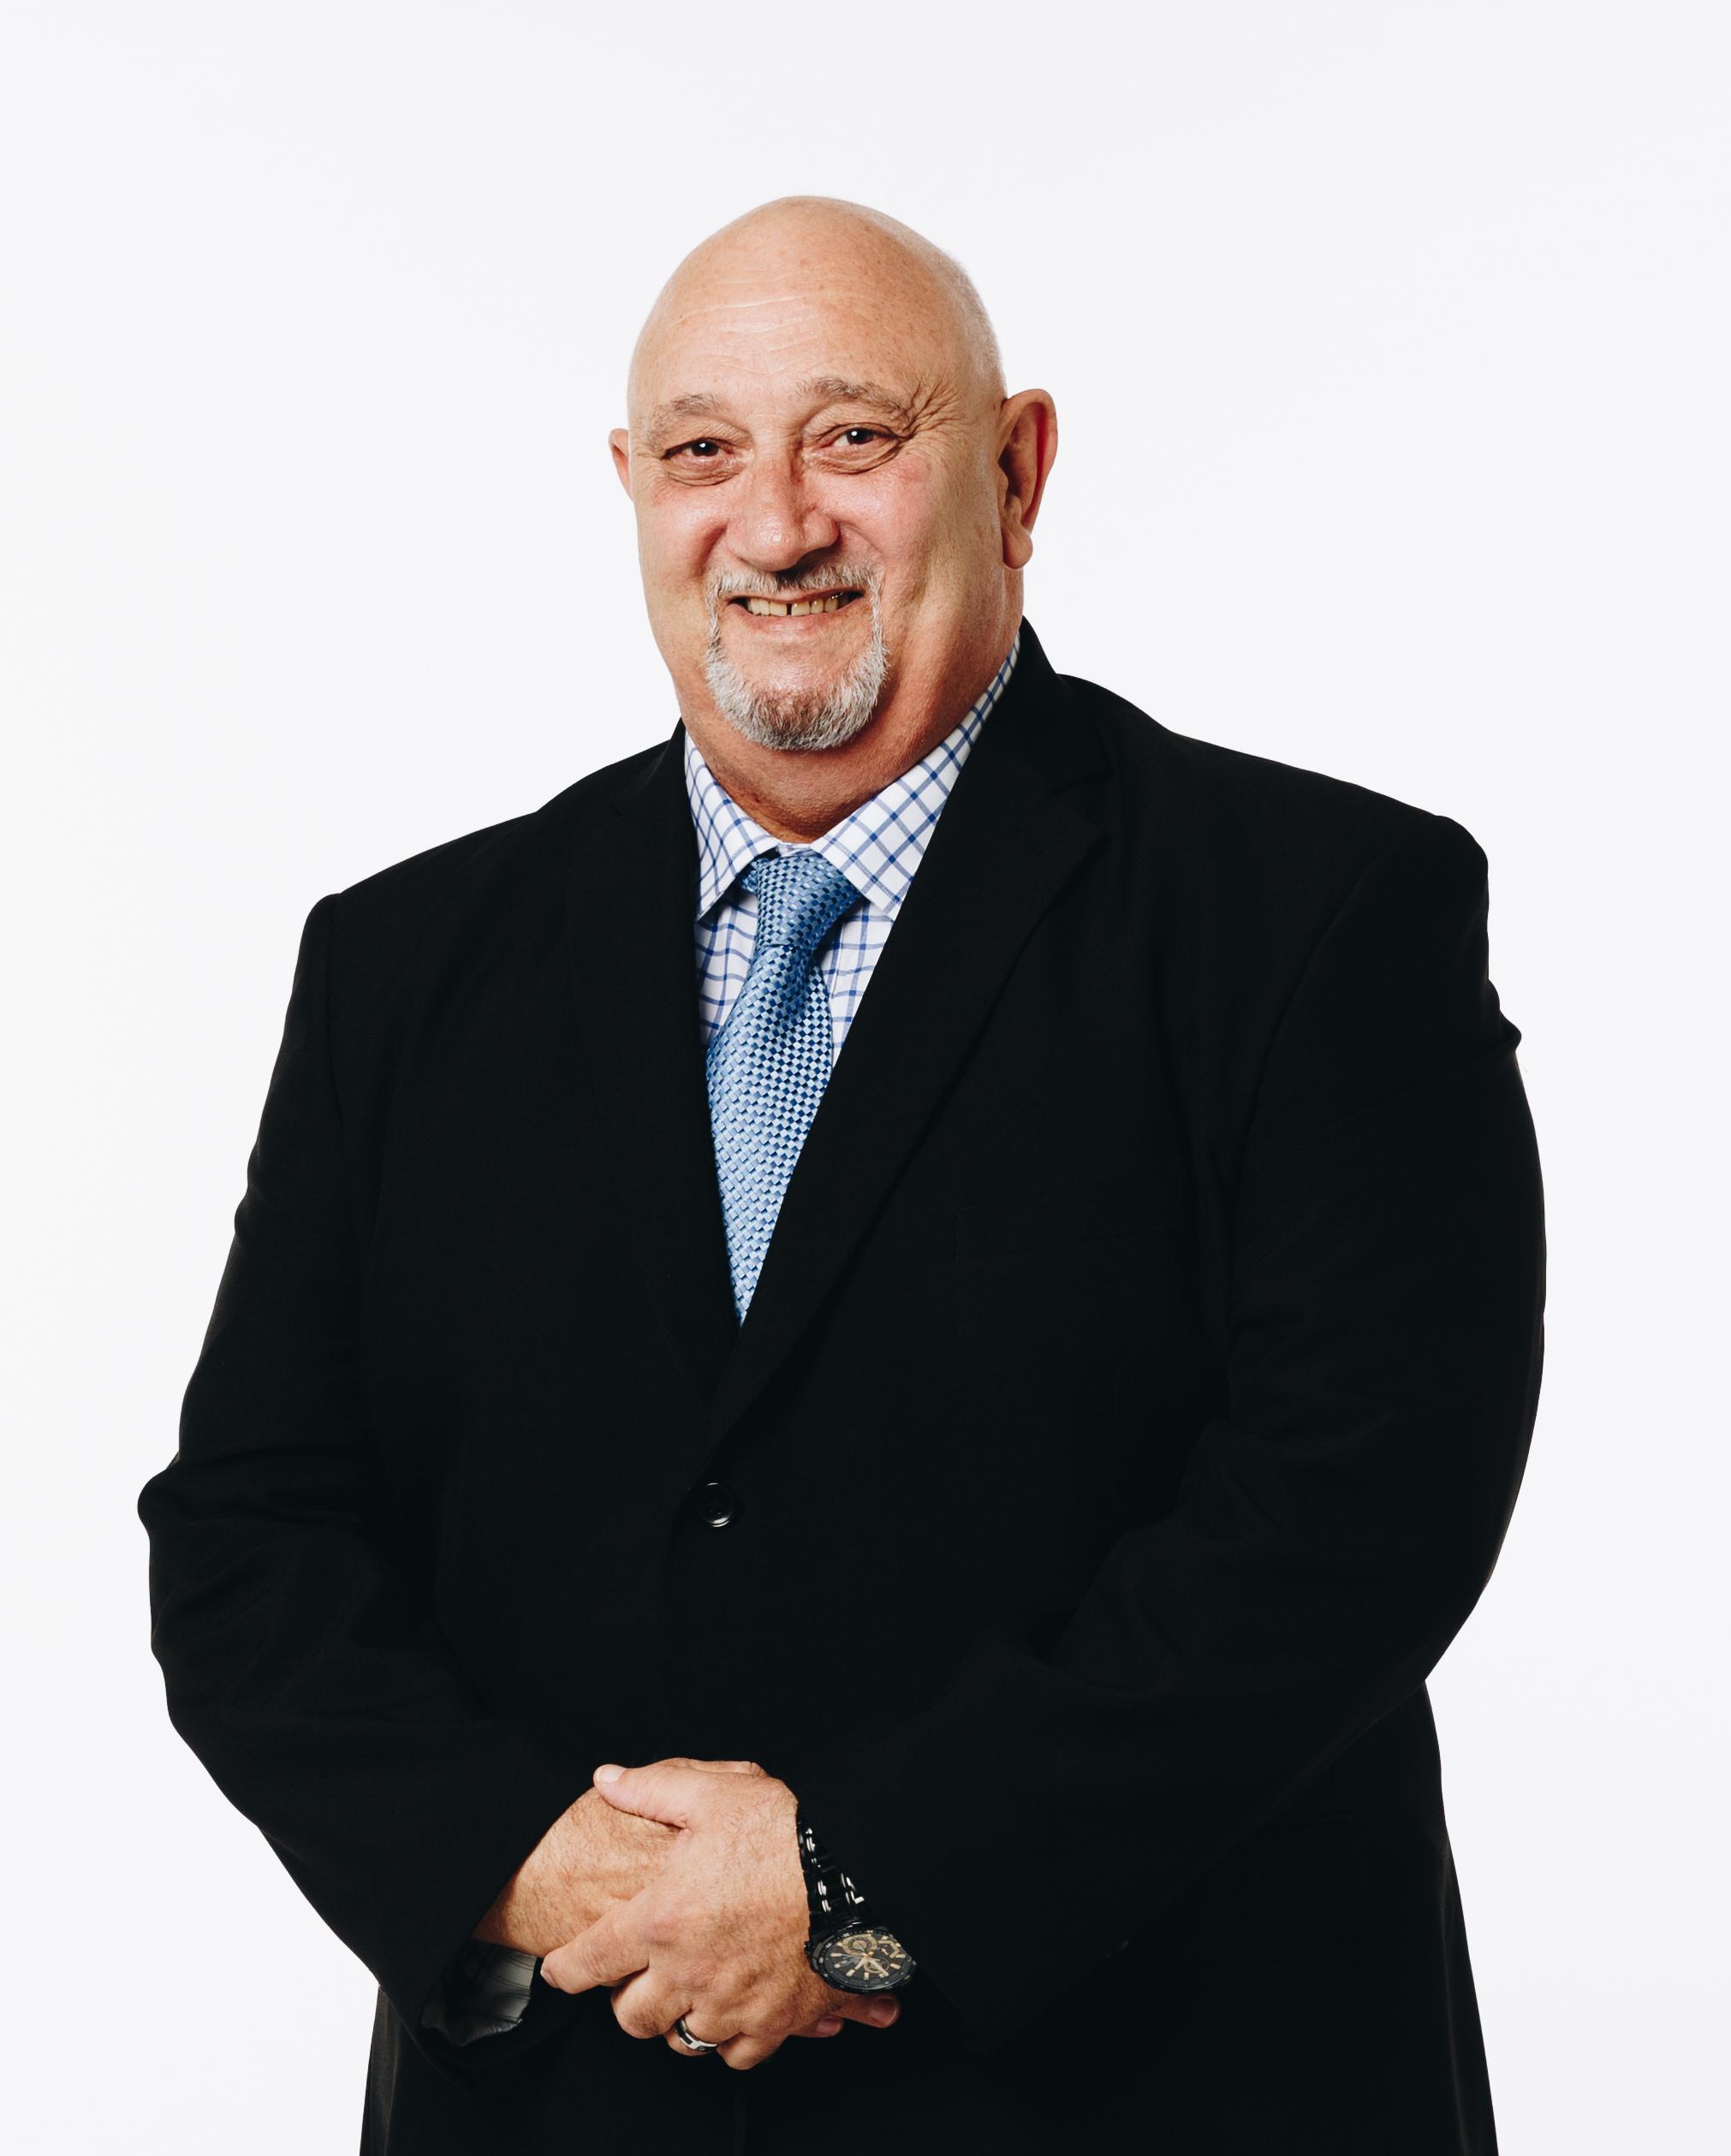 Michael Sayers